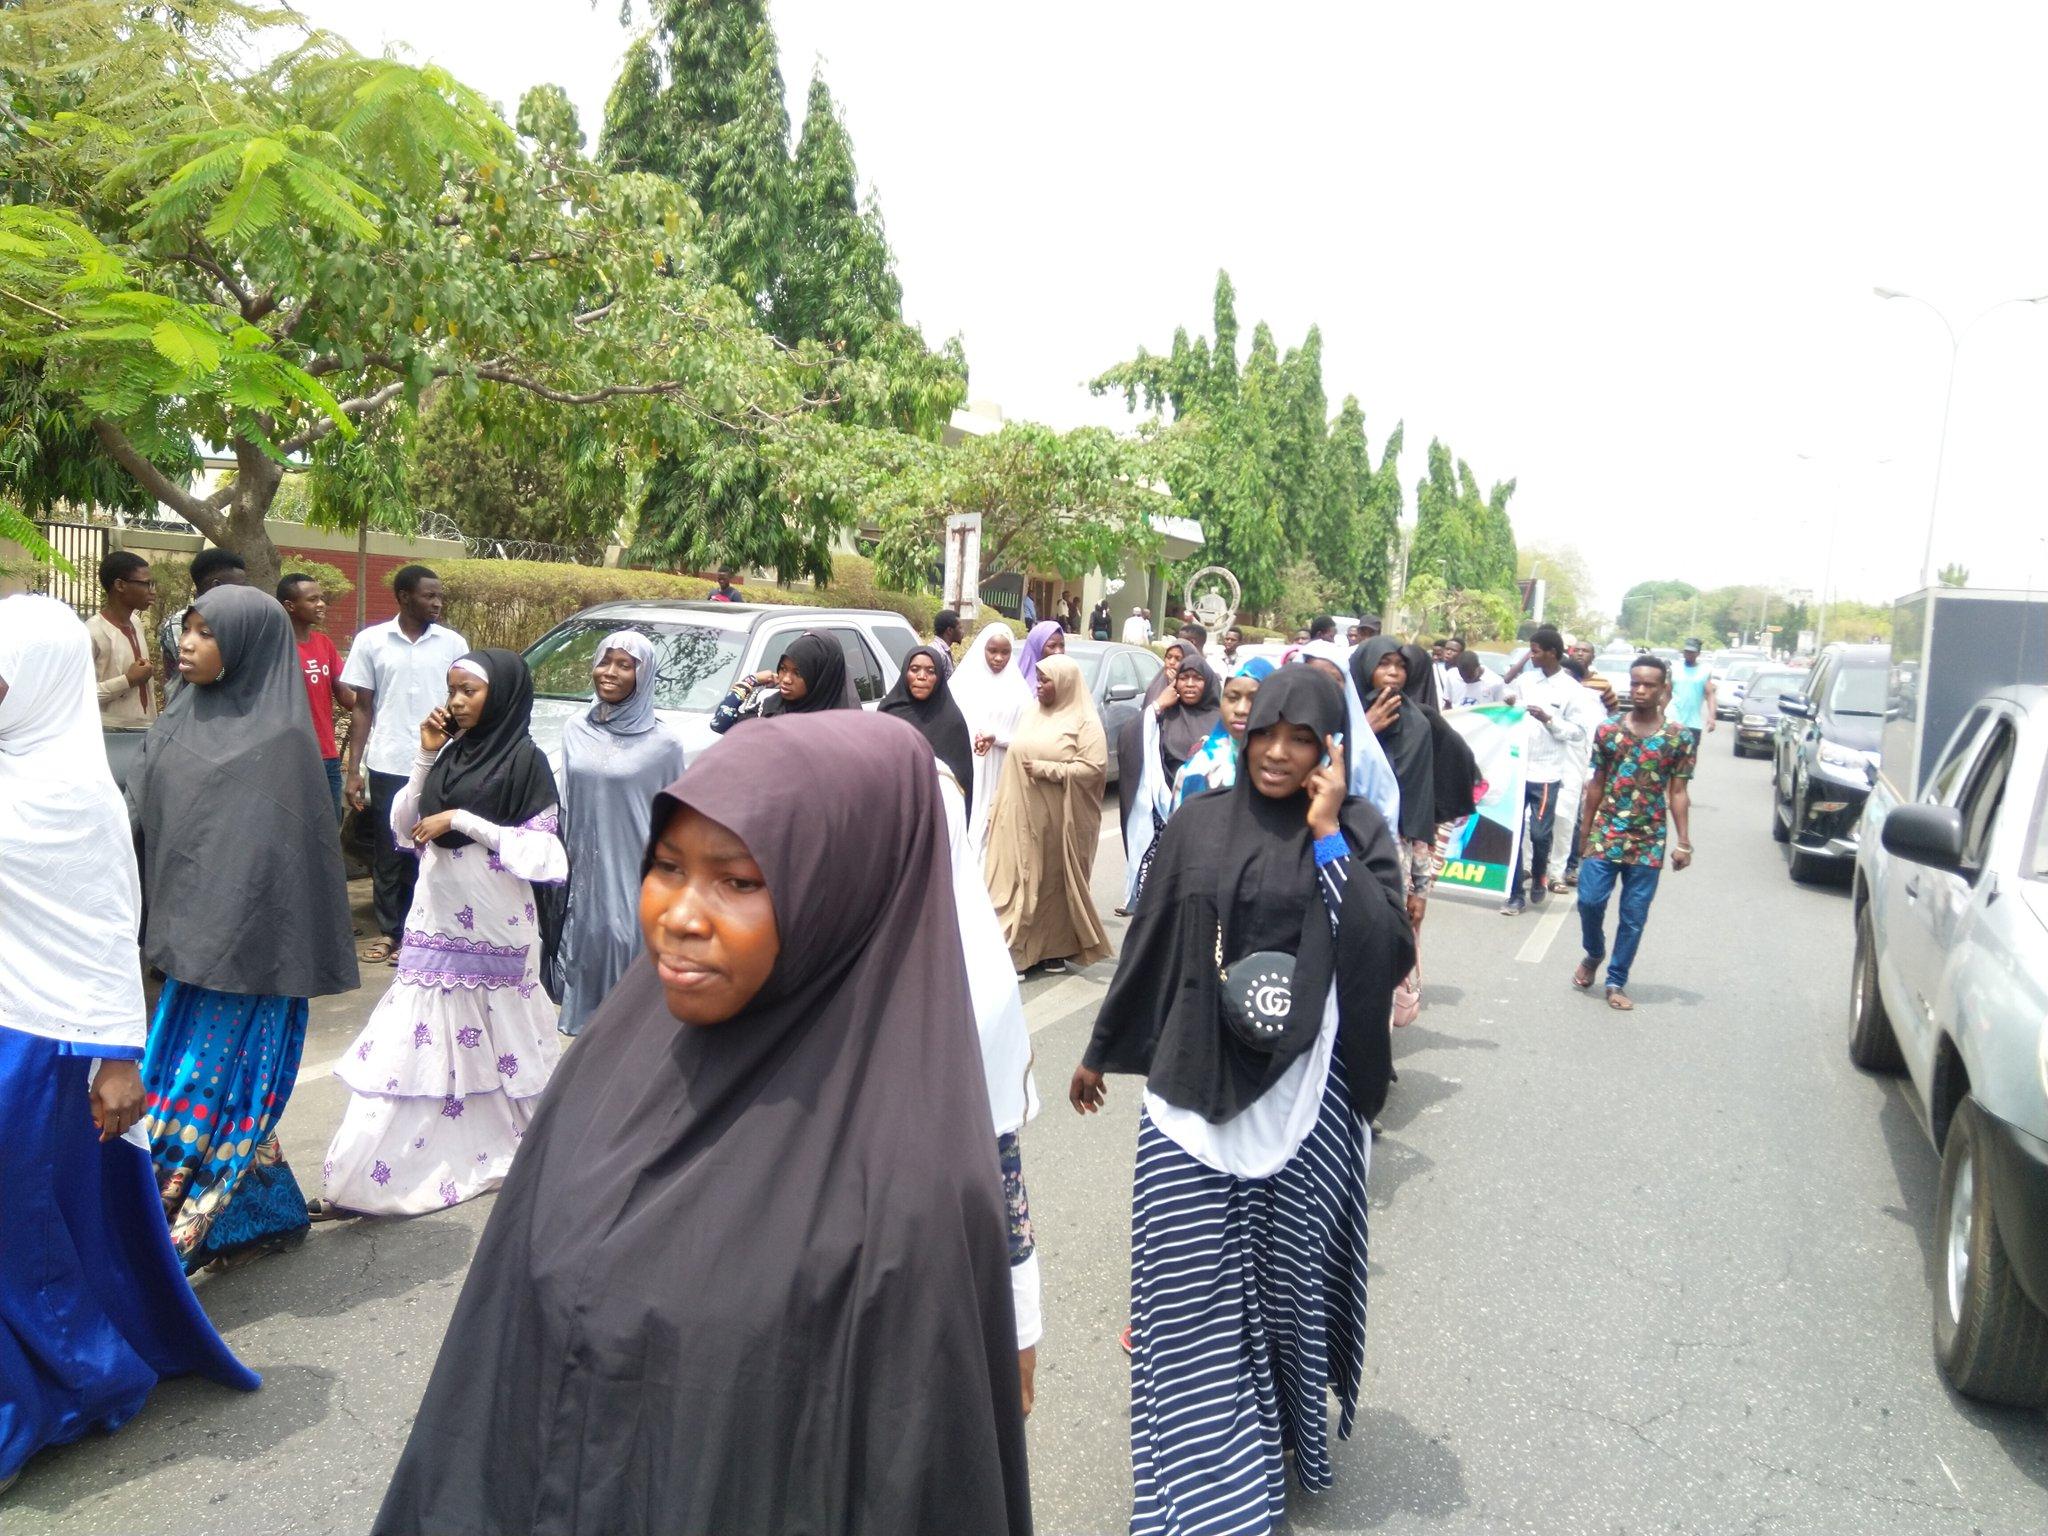 https://onlinenigeria.com/wp-content/uploads/2020/03/el-zakzaky-shiites-resumes-abuja-protest-3.jpg